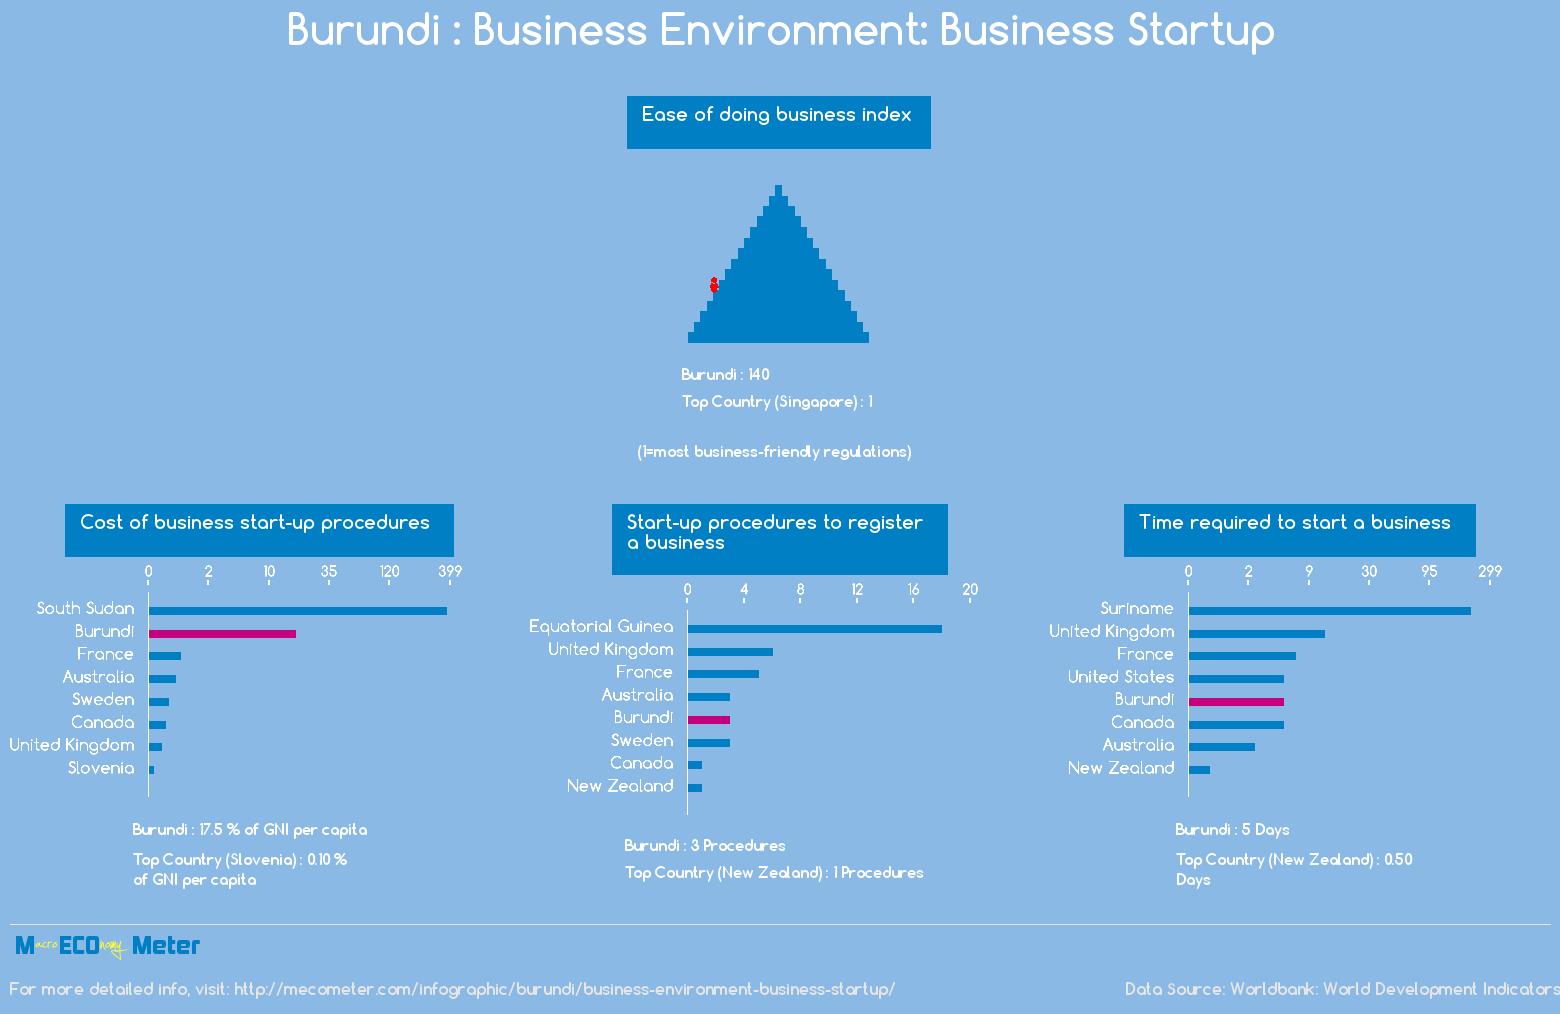 Burundi : Business Environment: Business Startup